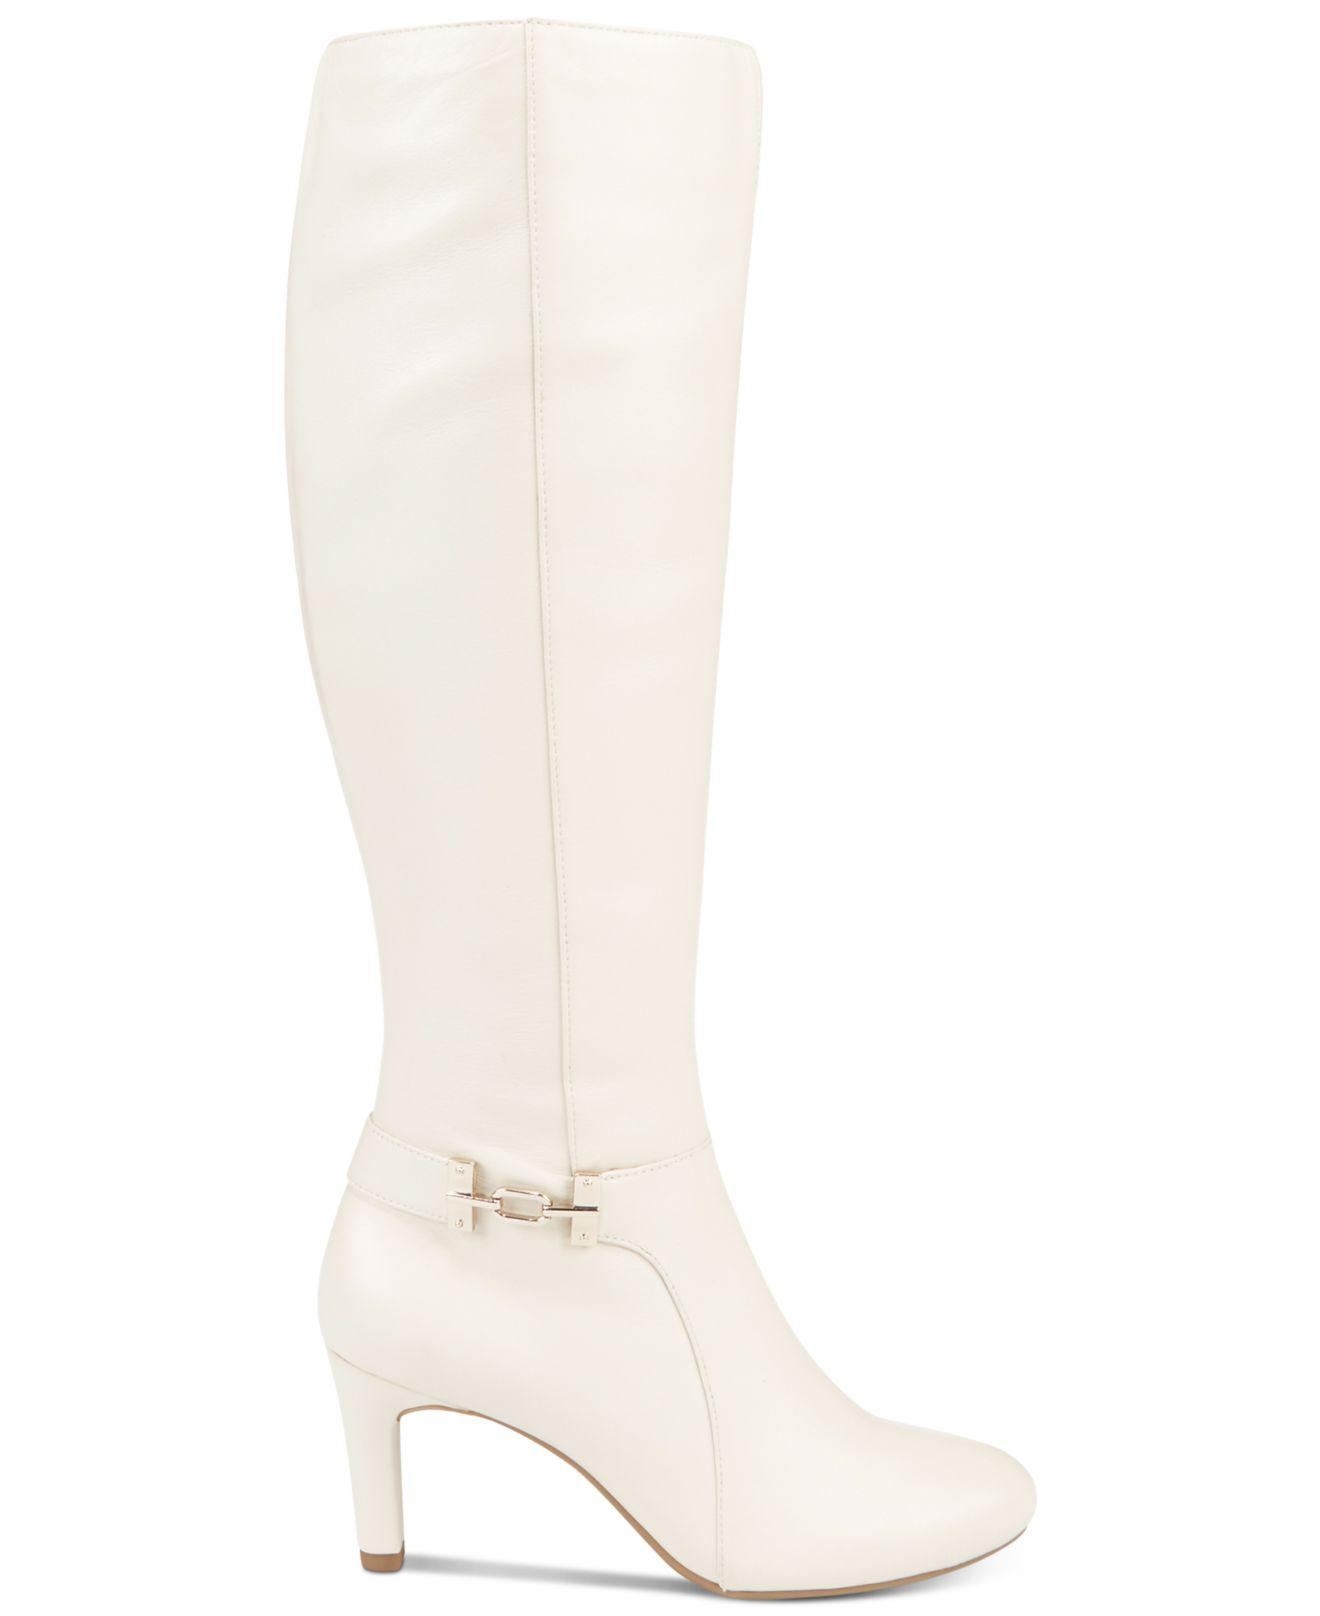 16d5ef687ca Lyst - Bandolino Lamari Wide-calf Dress Boots in White